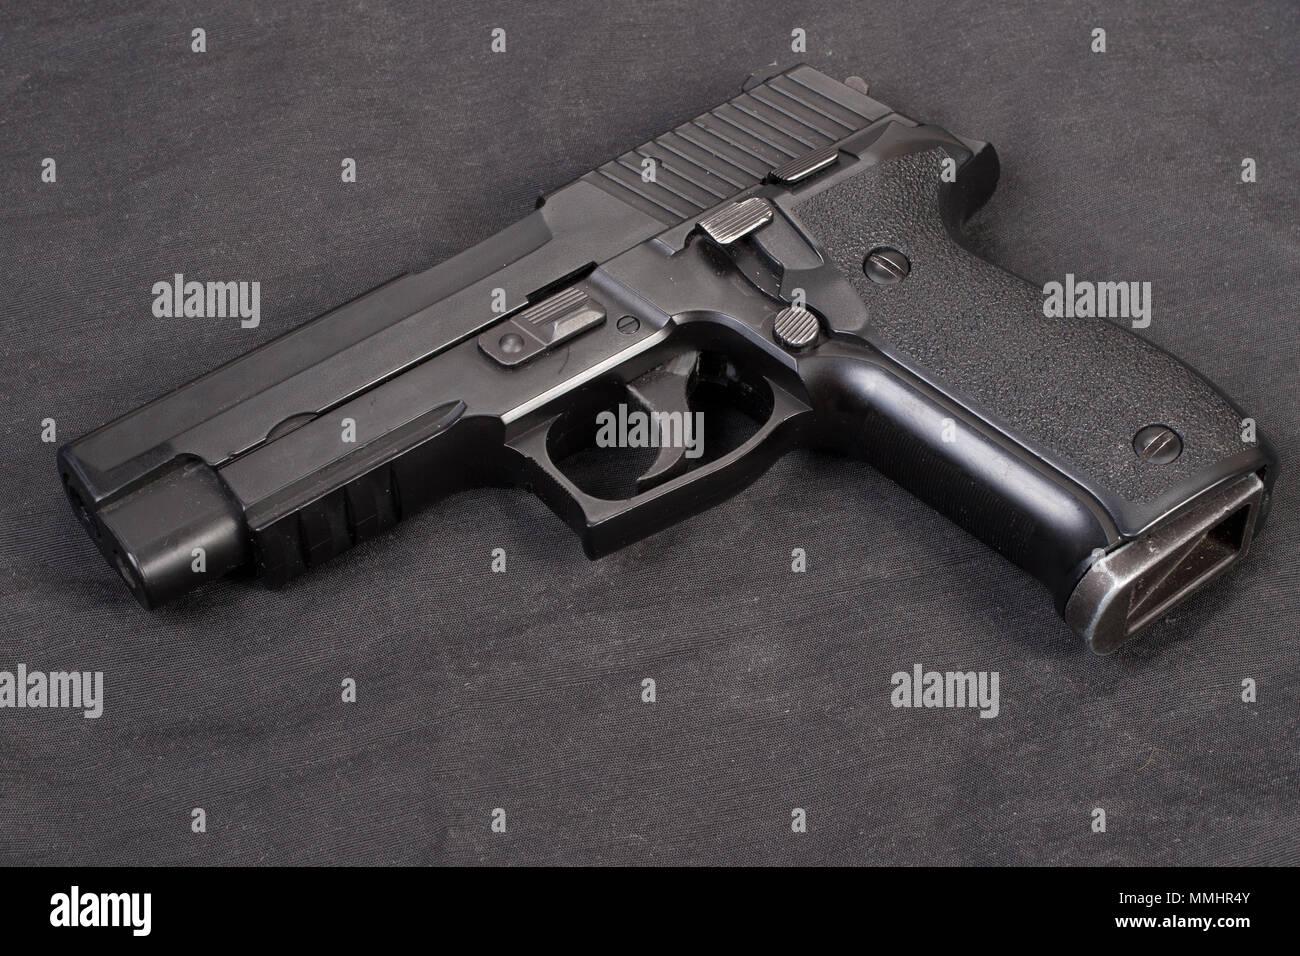 sig sauer hand gun on black - Stock Image